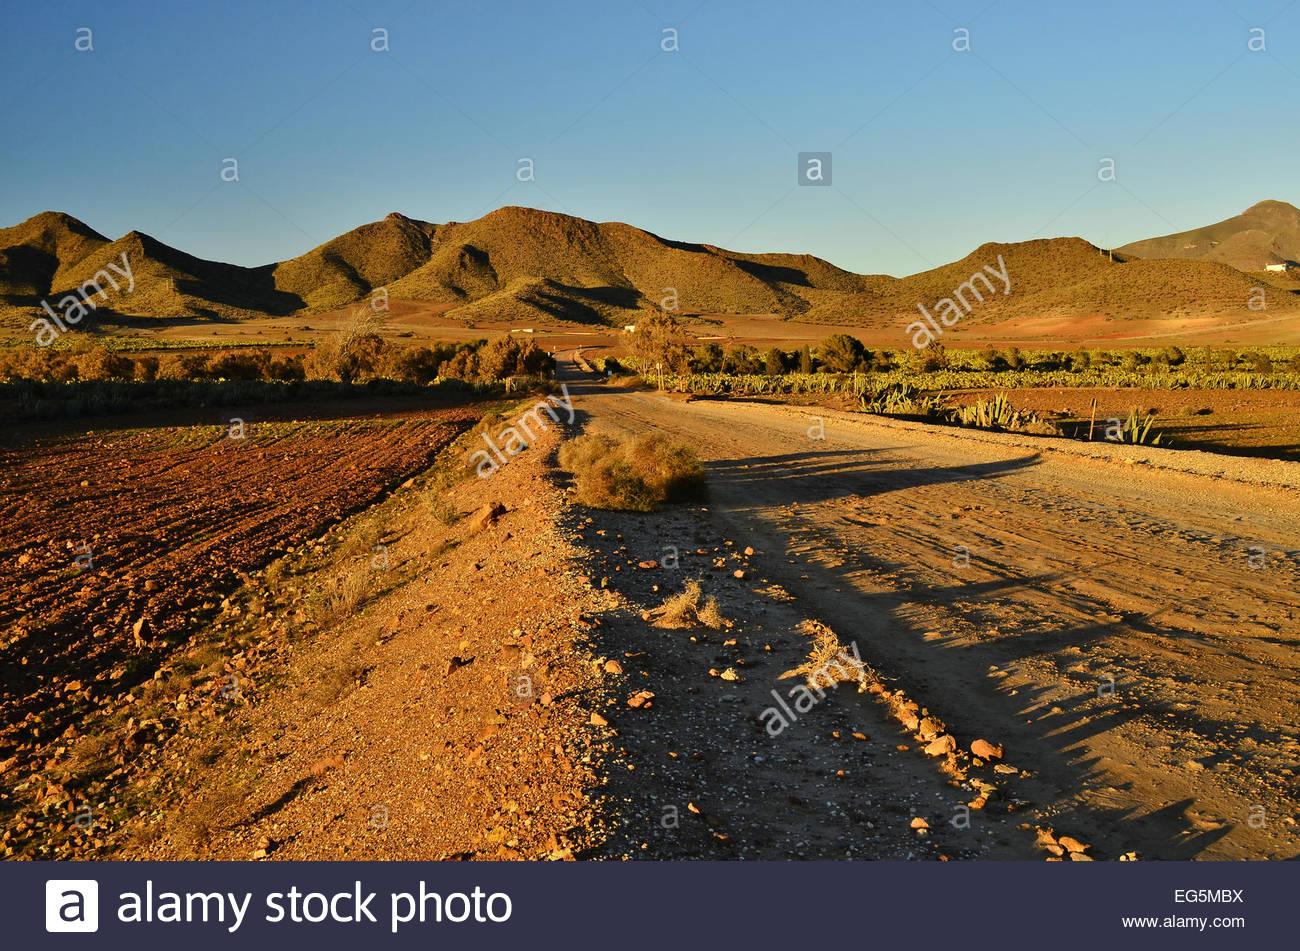 Dirt (unpaved) road through arid desert landscape of Cabo de Gata Natural Park, Almeria Andalusia Southern Spain - Stock Image